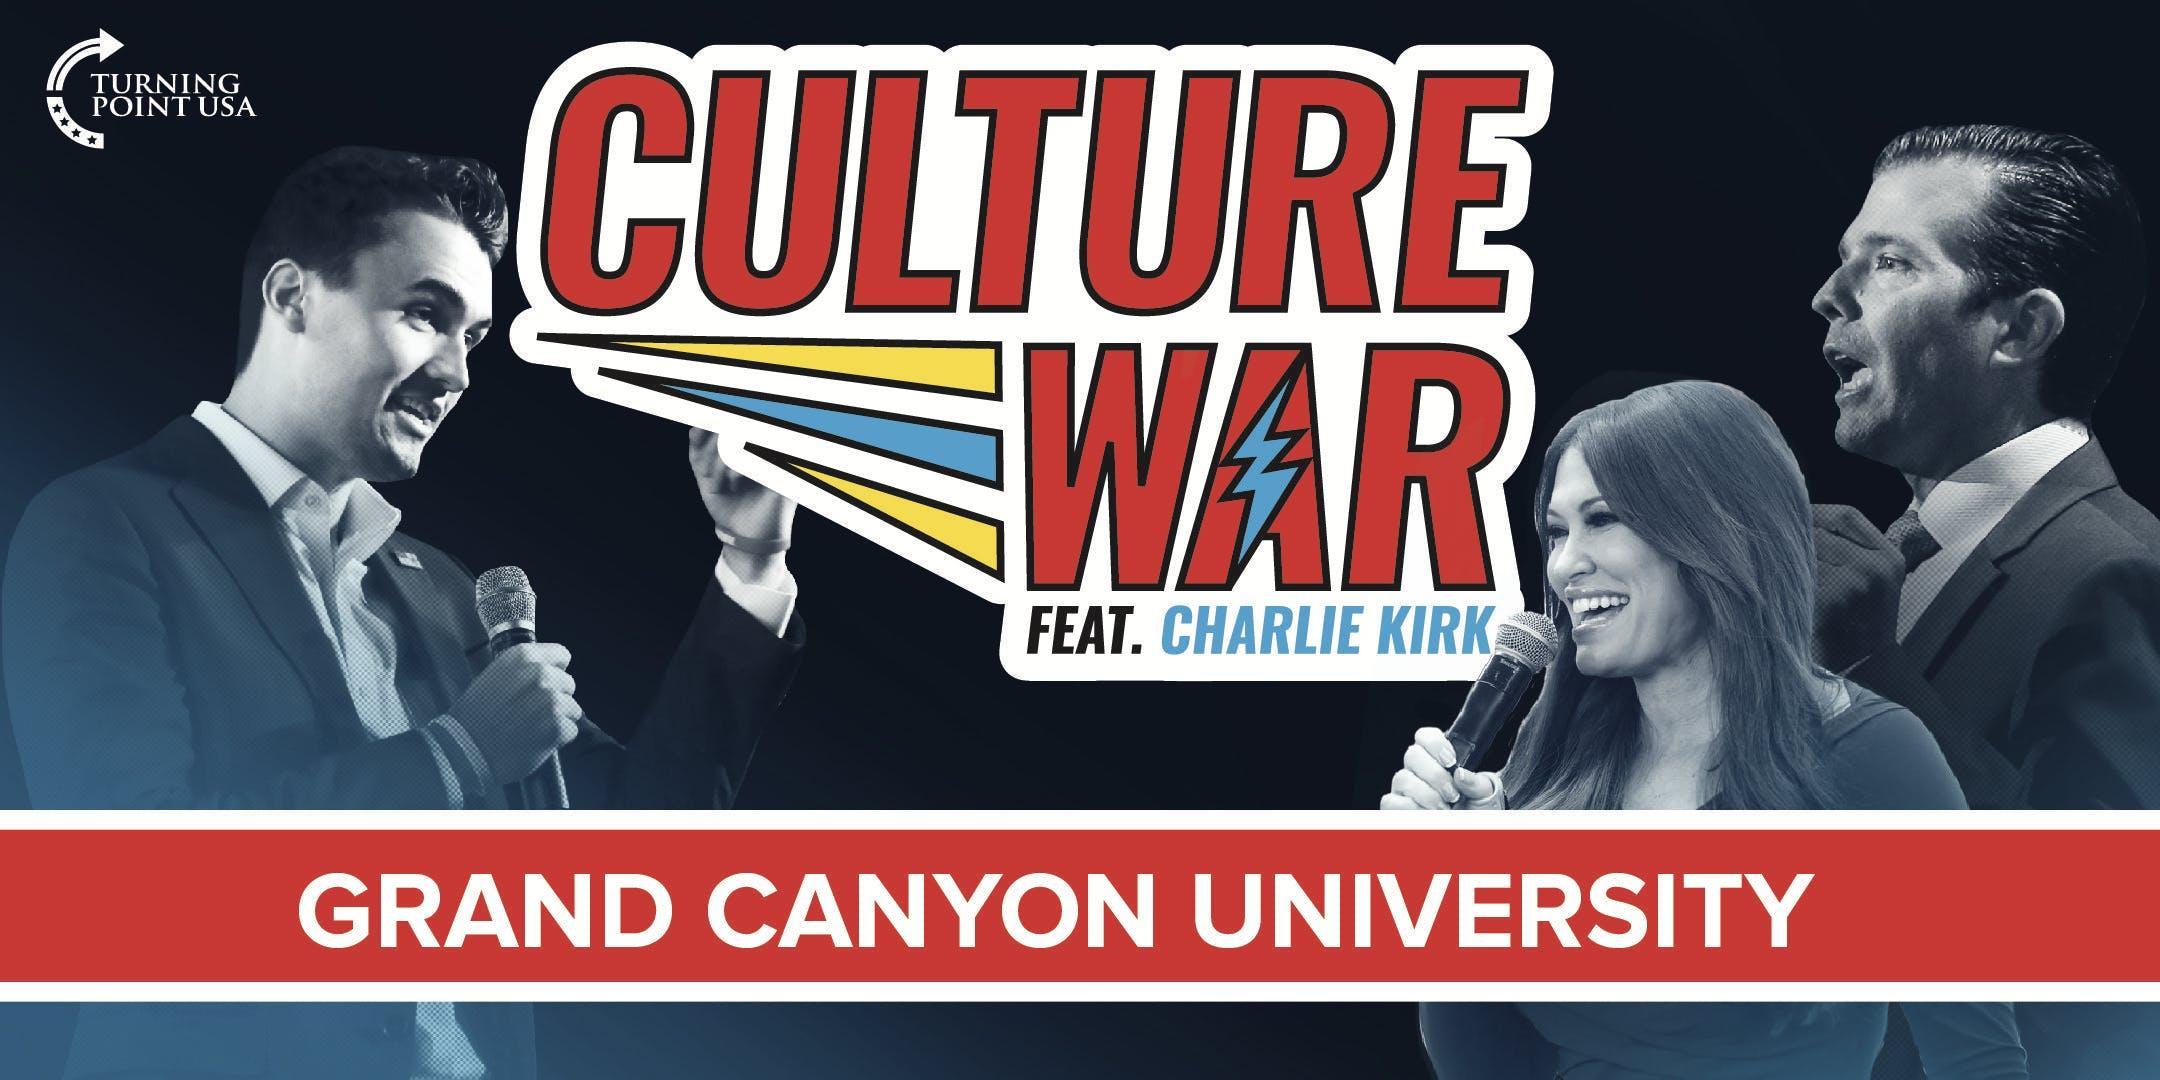 Culture War at Grand Canyon University feat. Charlie Kirk & Donald Trump Jr